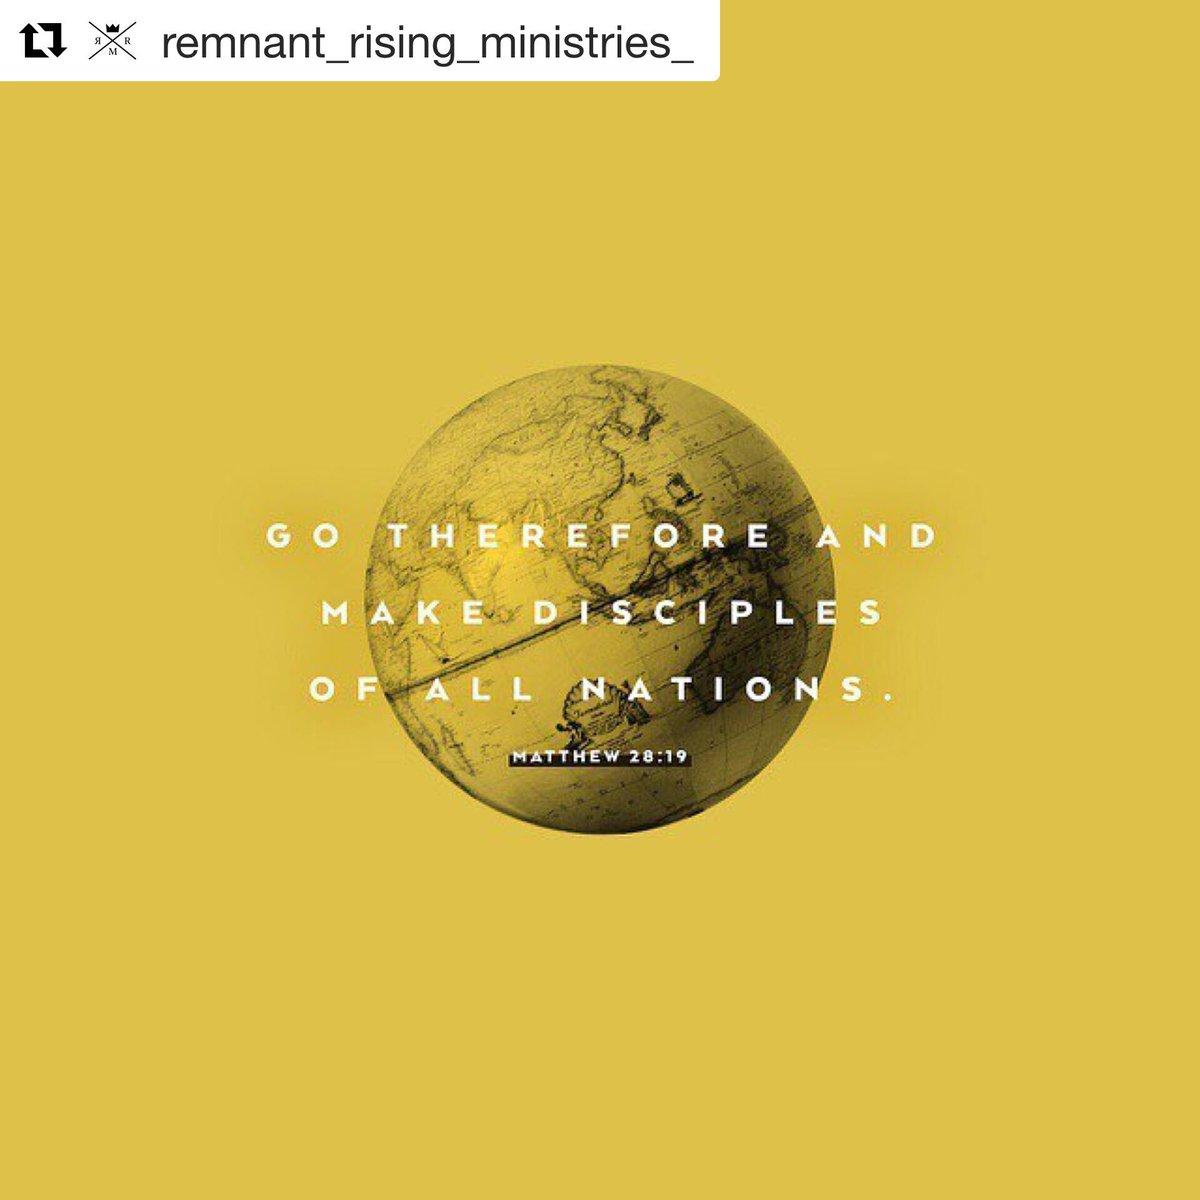 remnantrisingministries hashtag on Twitter